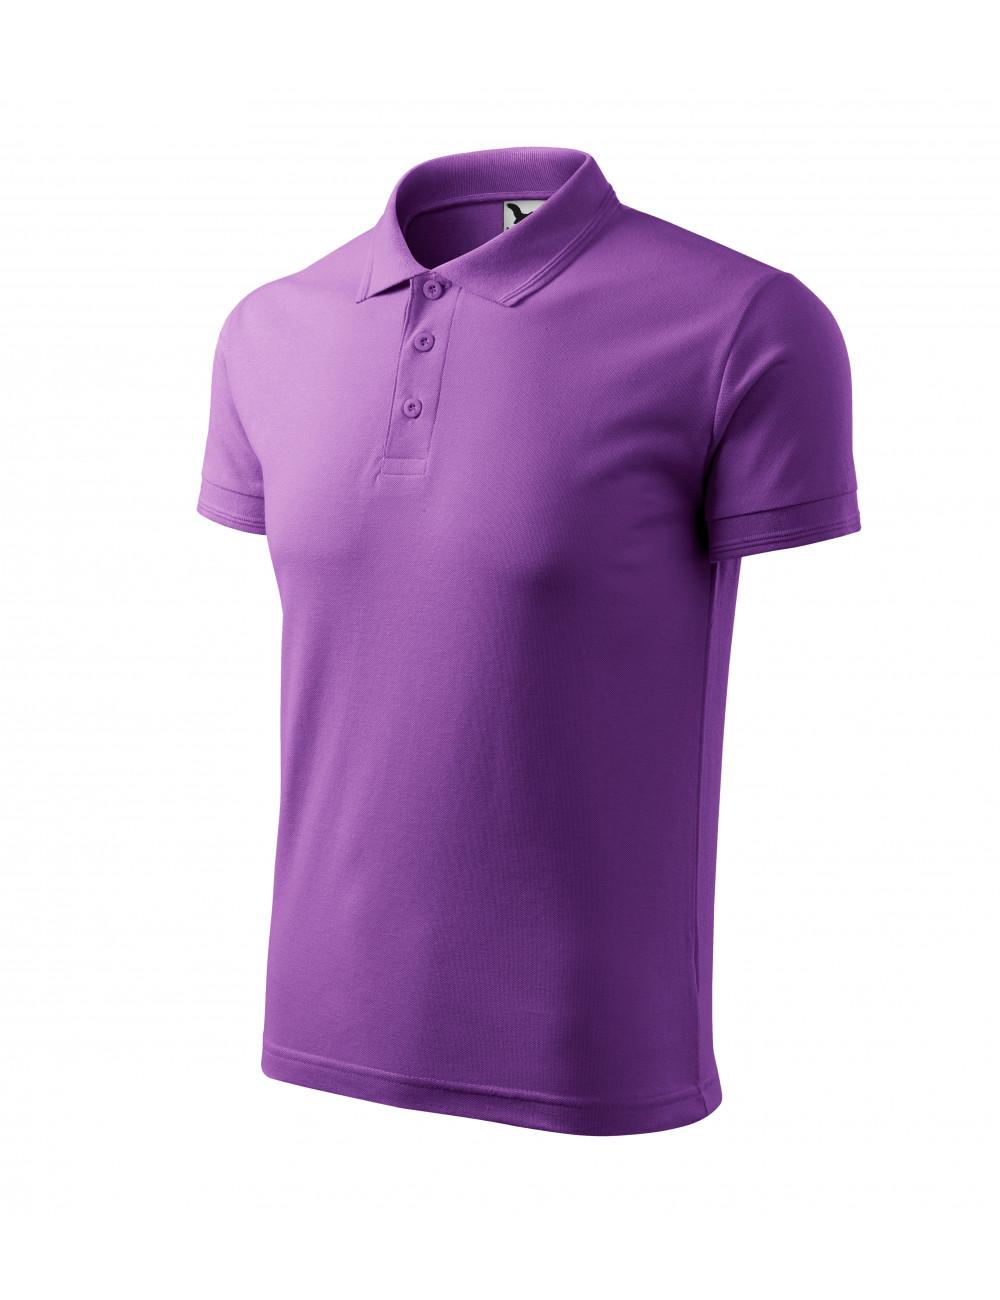 Adler MALFINI Koszulka polo męska Pique Polo 203 fioletowy